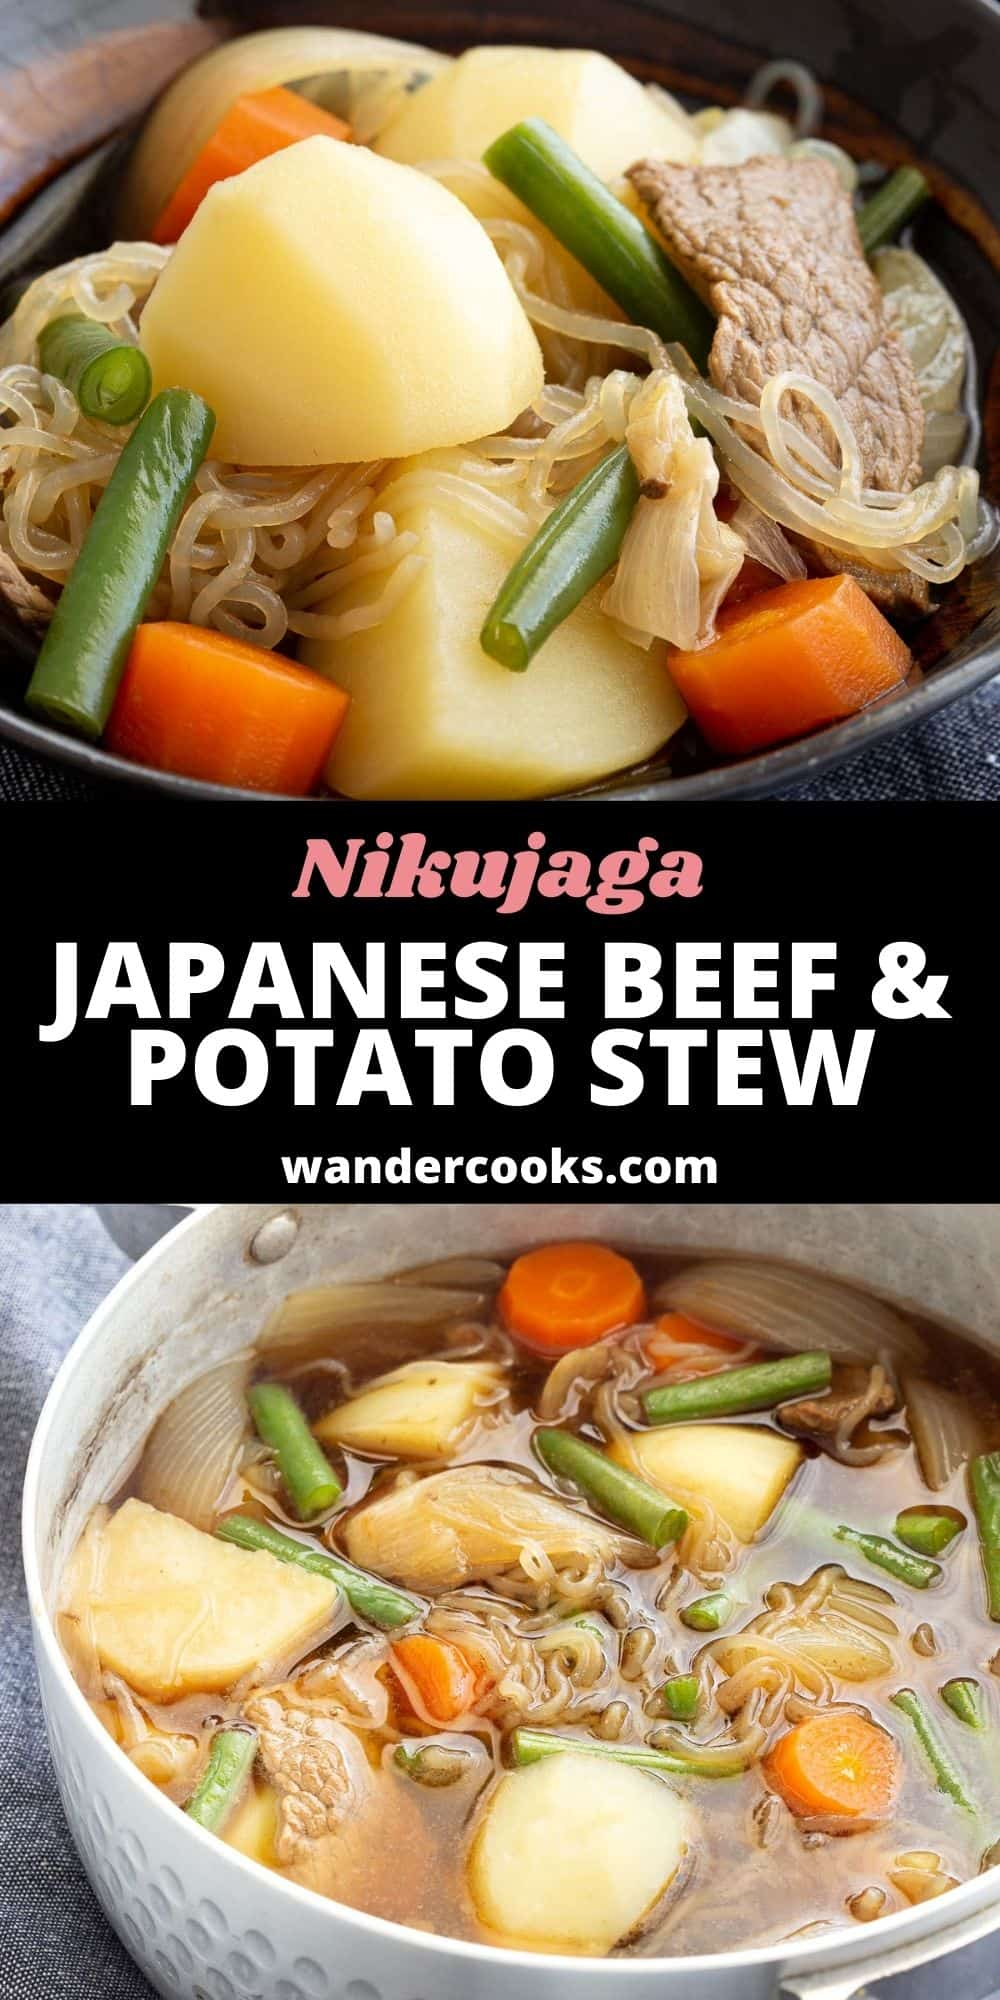 One Pot Nikujaga - Japanese Beef and Potato Stew